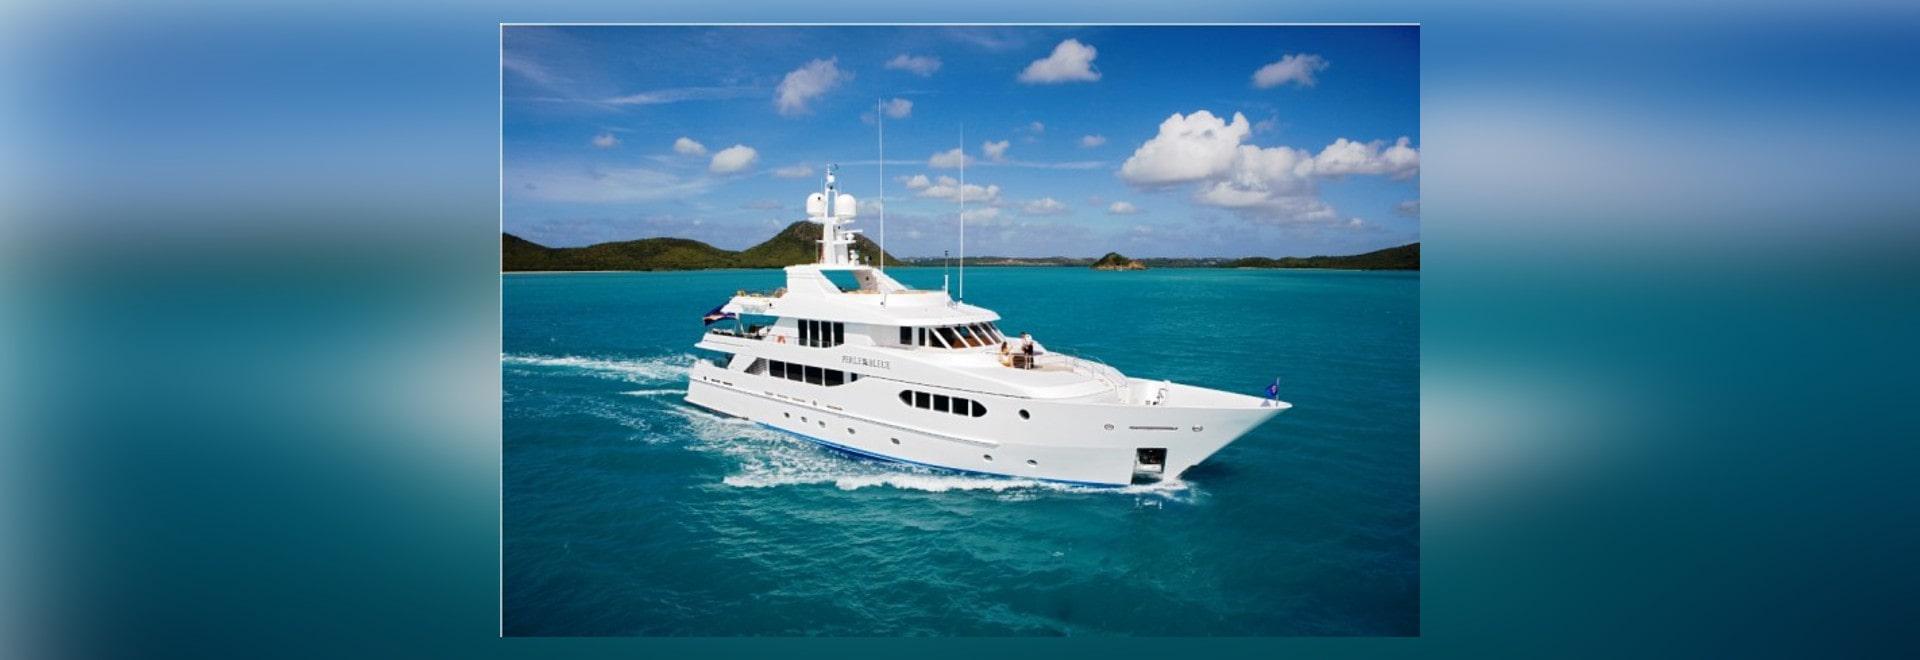 News: Superyacht PERLE BLEUE available for Caribbean and Bahamas Yacht Charter